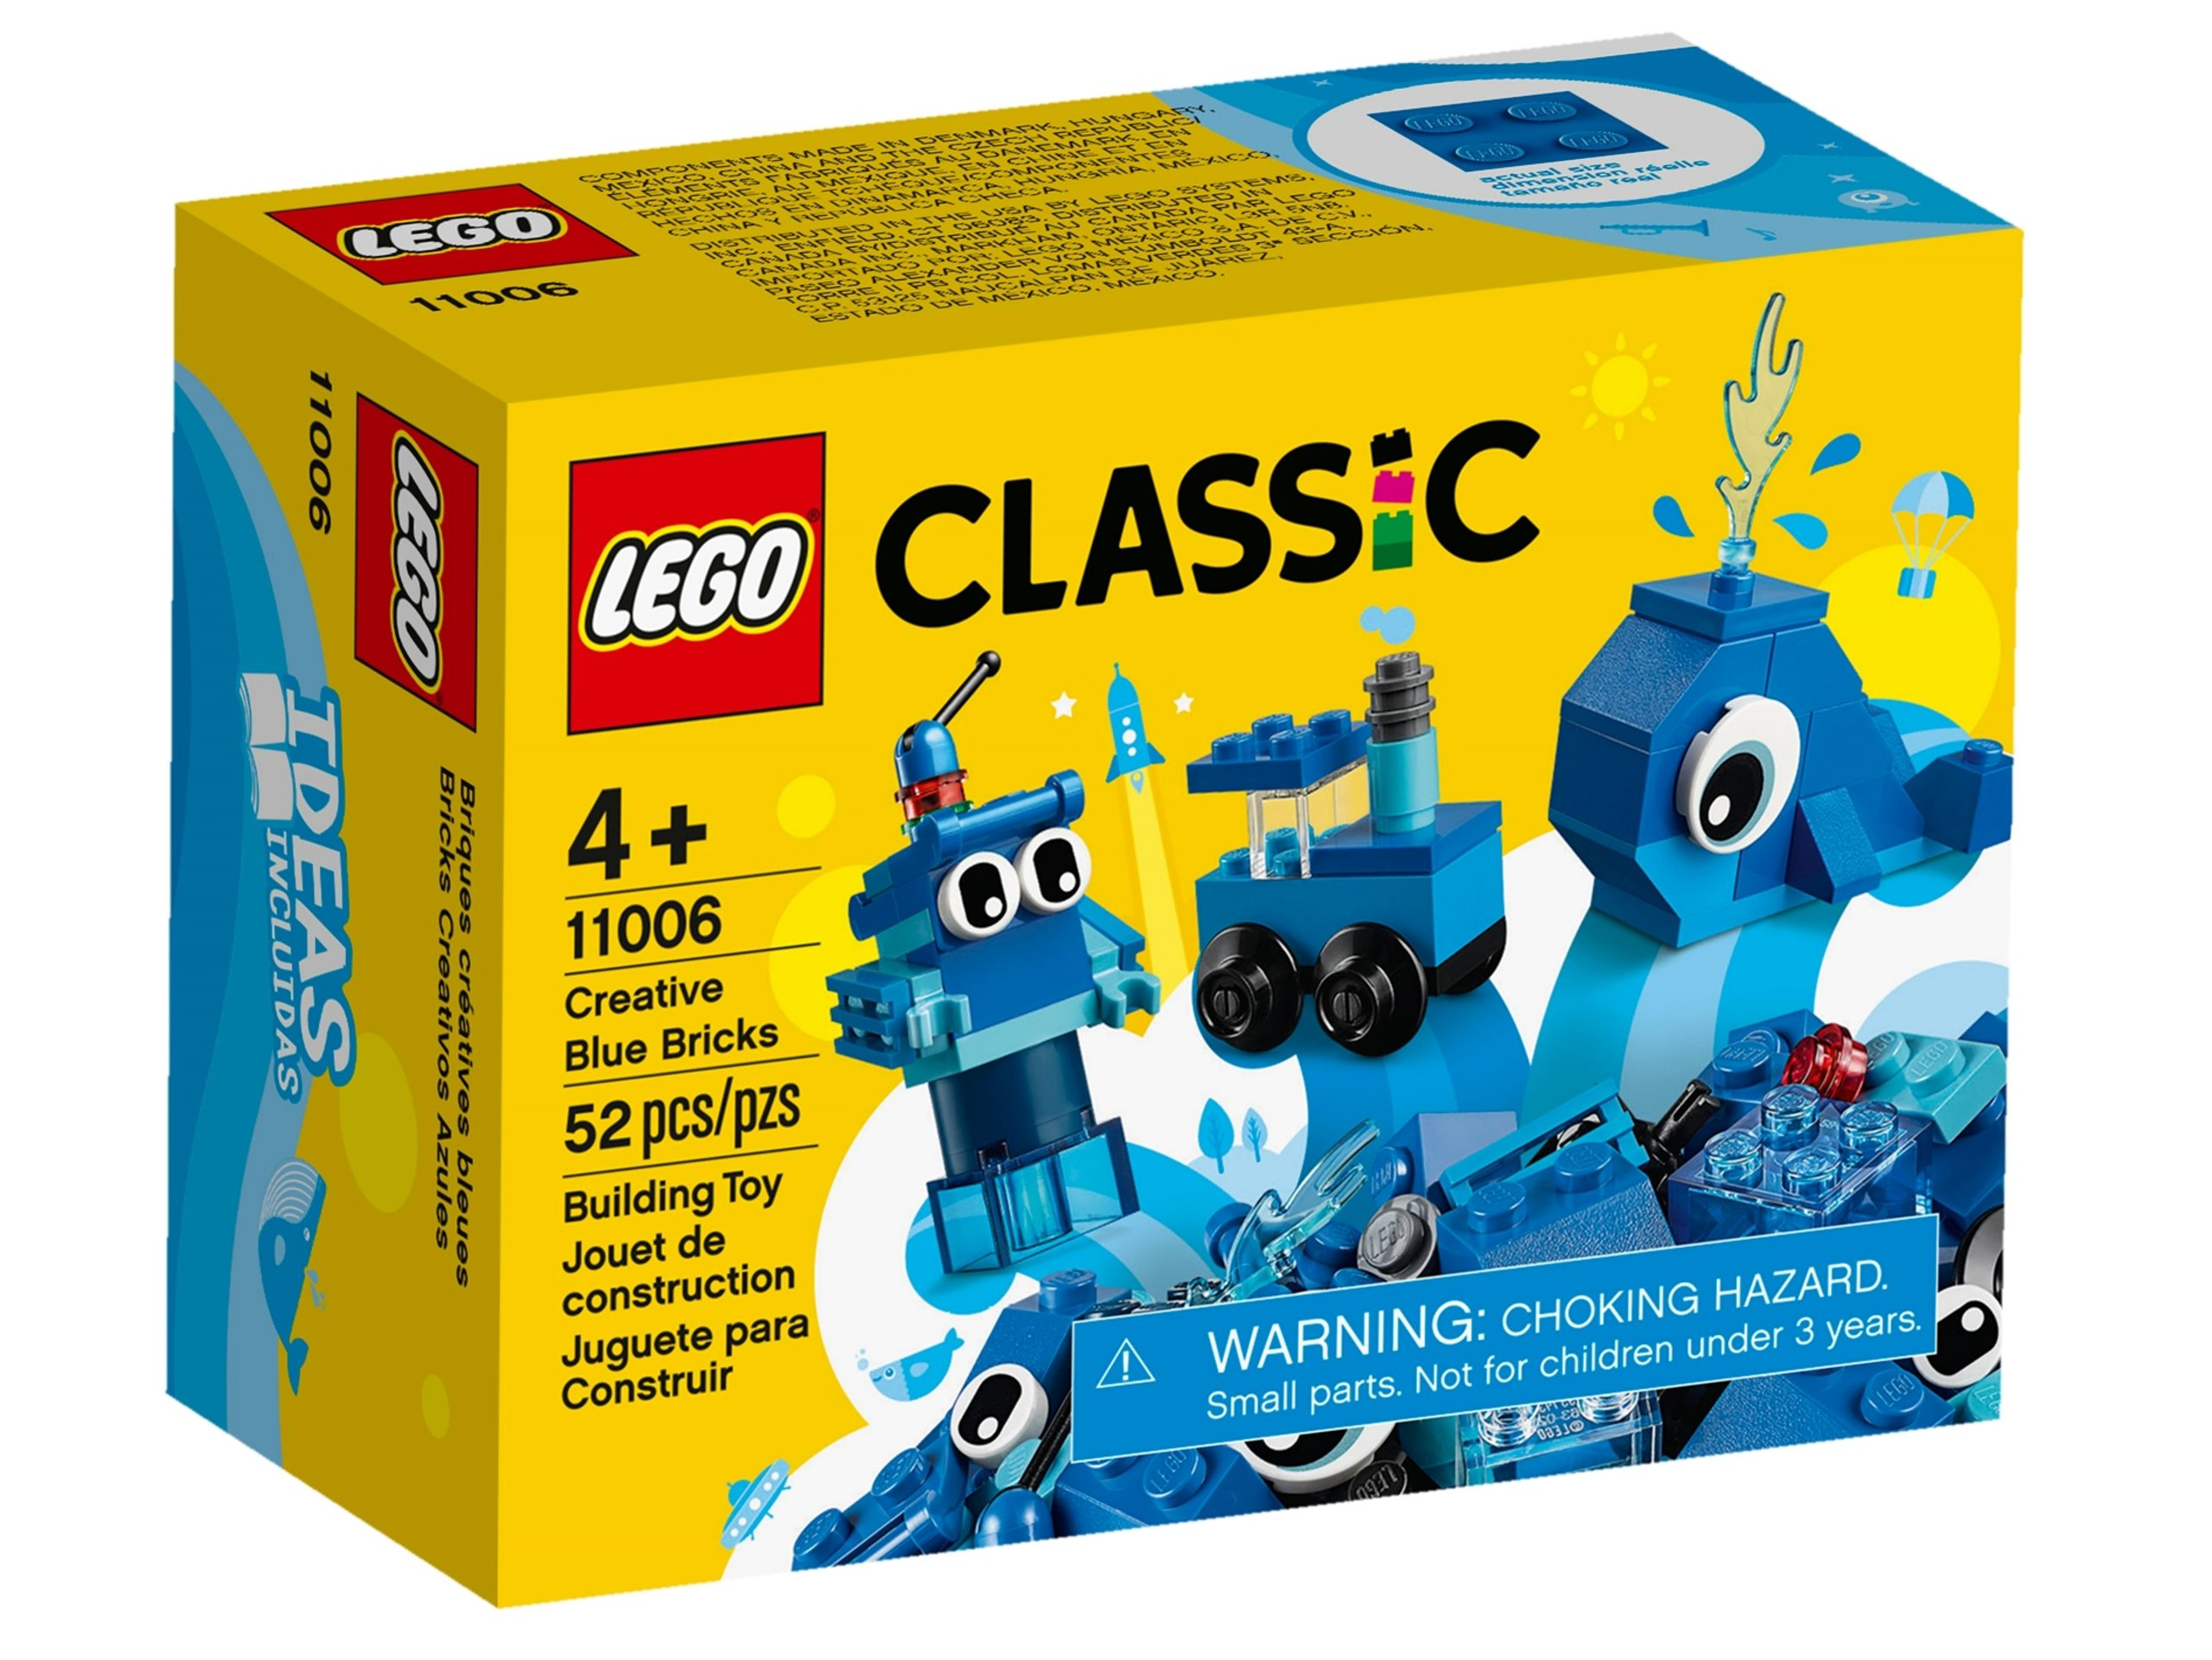 lego 11006 briques creatives bleues scaled